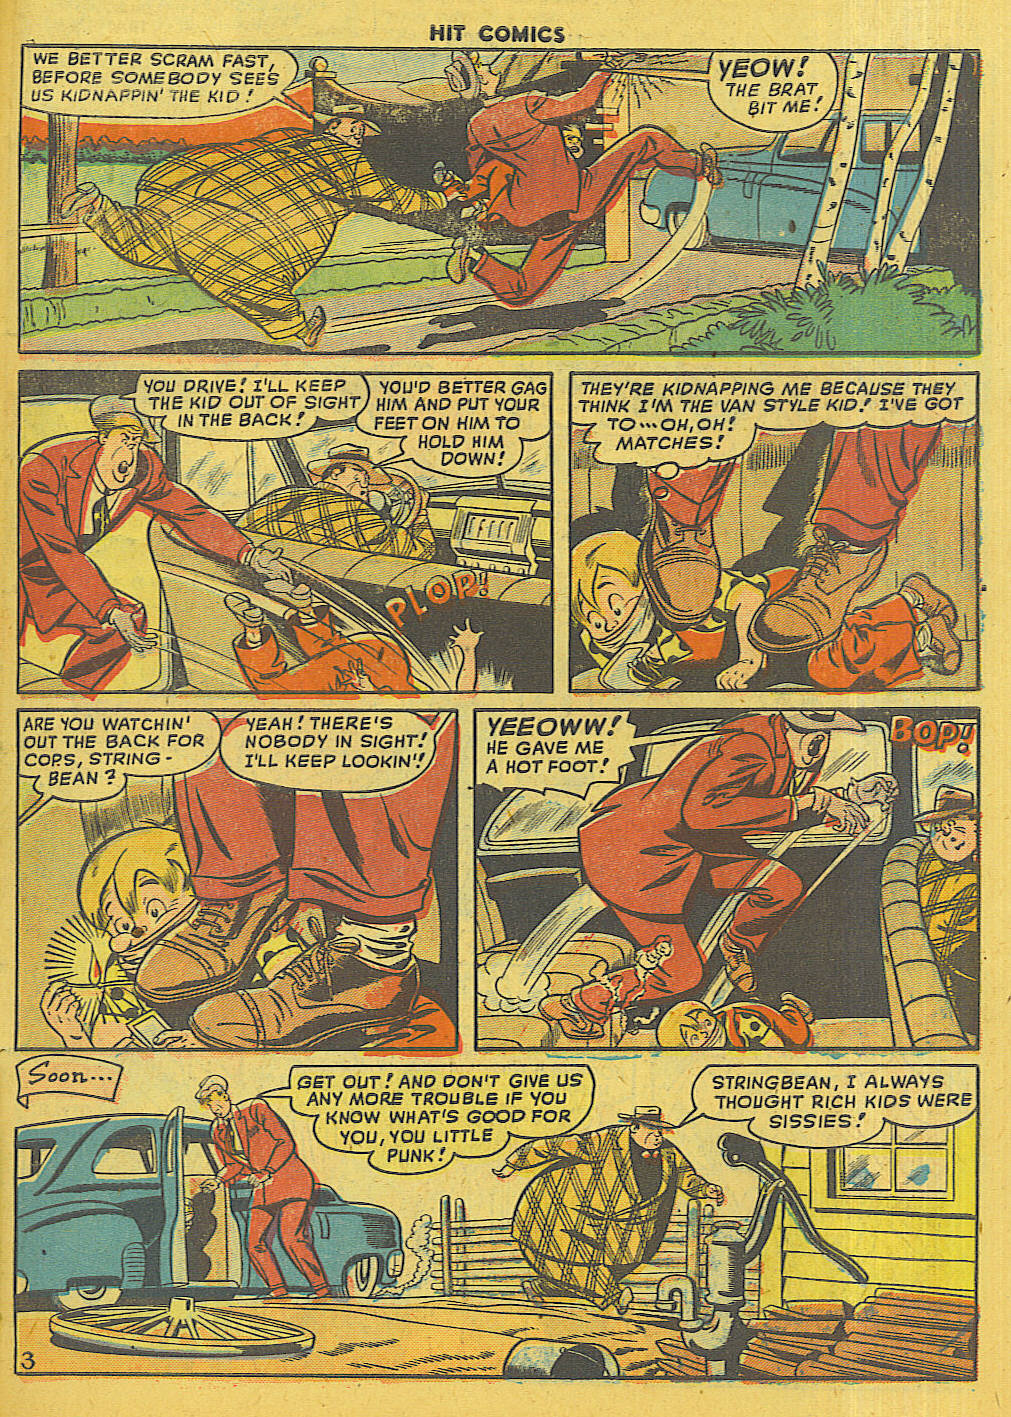 Read online Hit Comics comic -  Issue #56 - 45